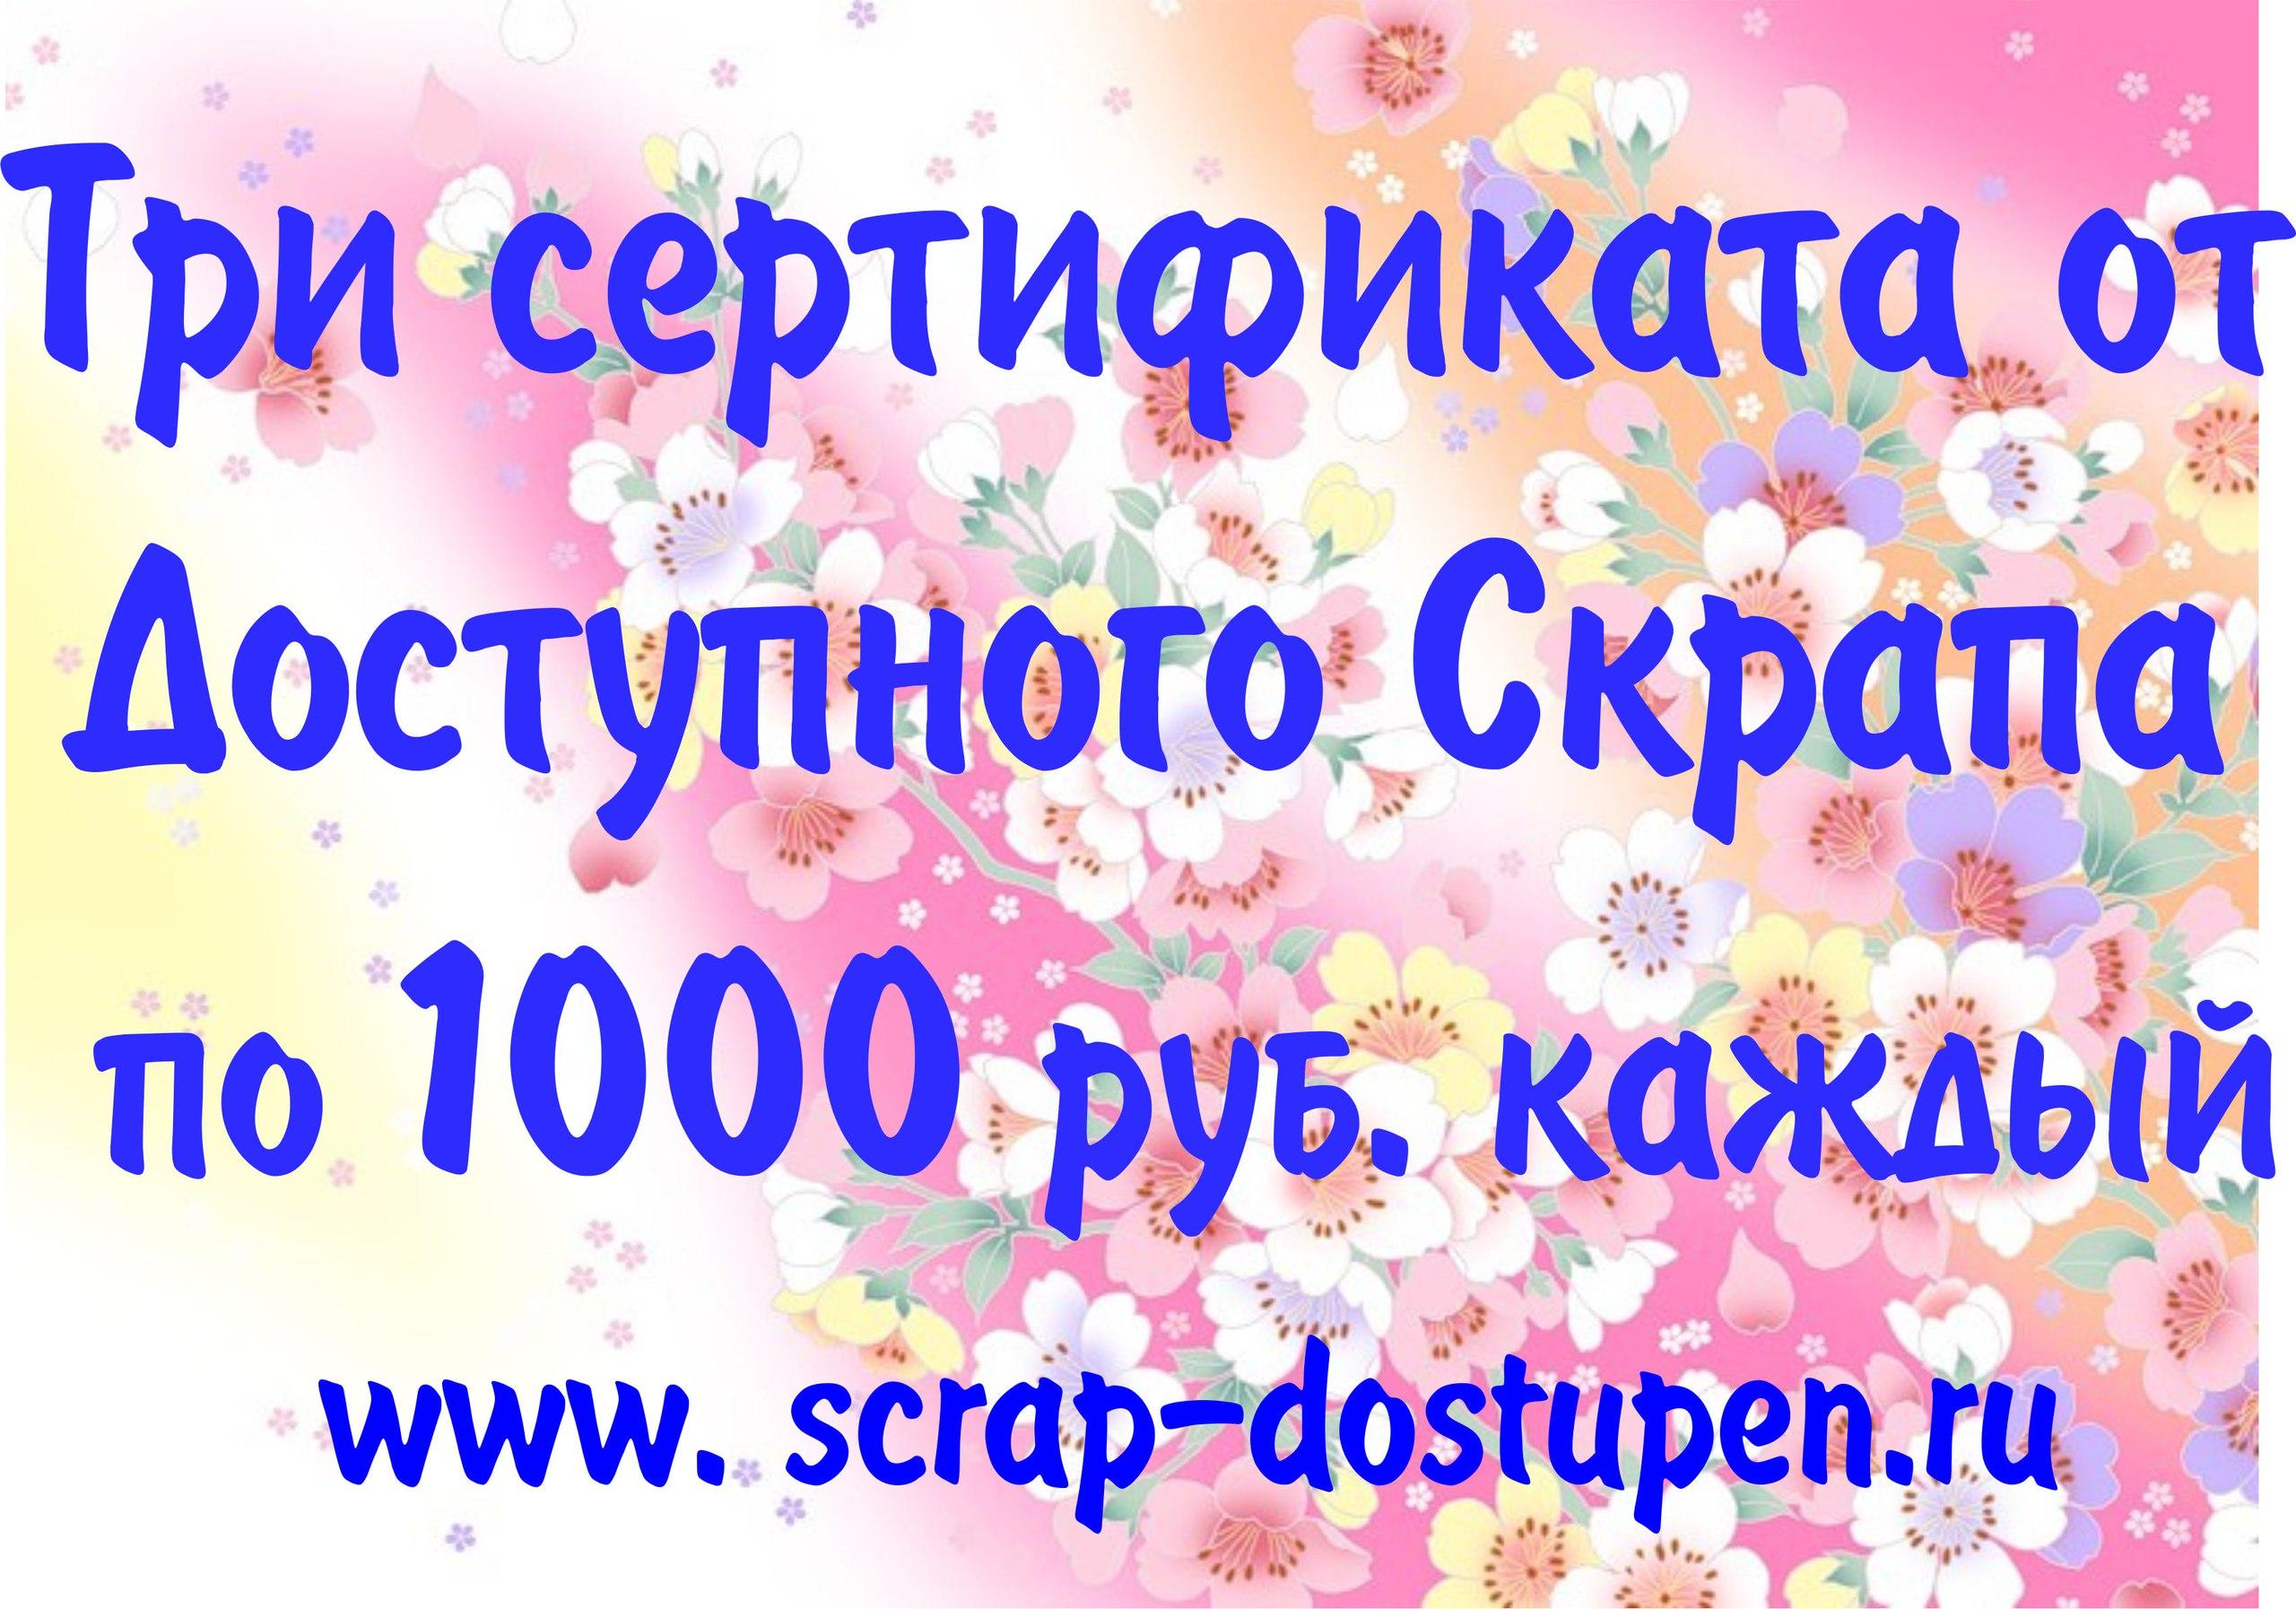 https://vk.com/wall-33755079_8603